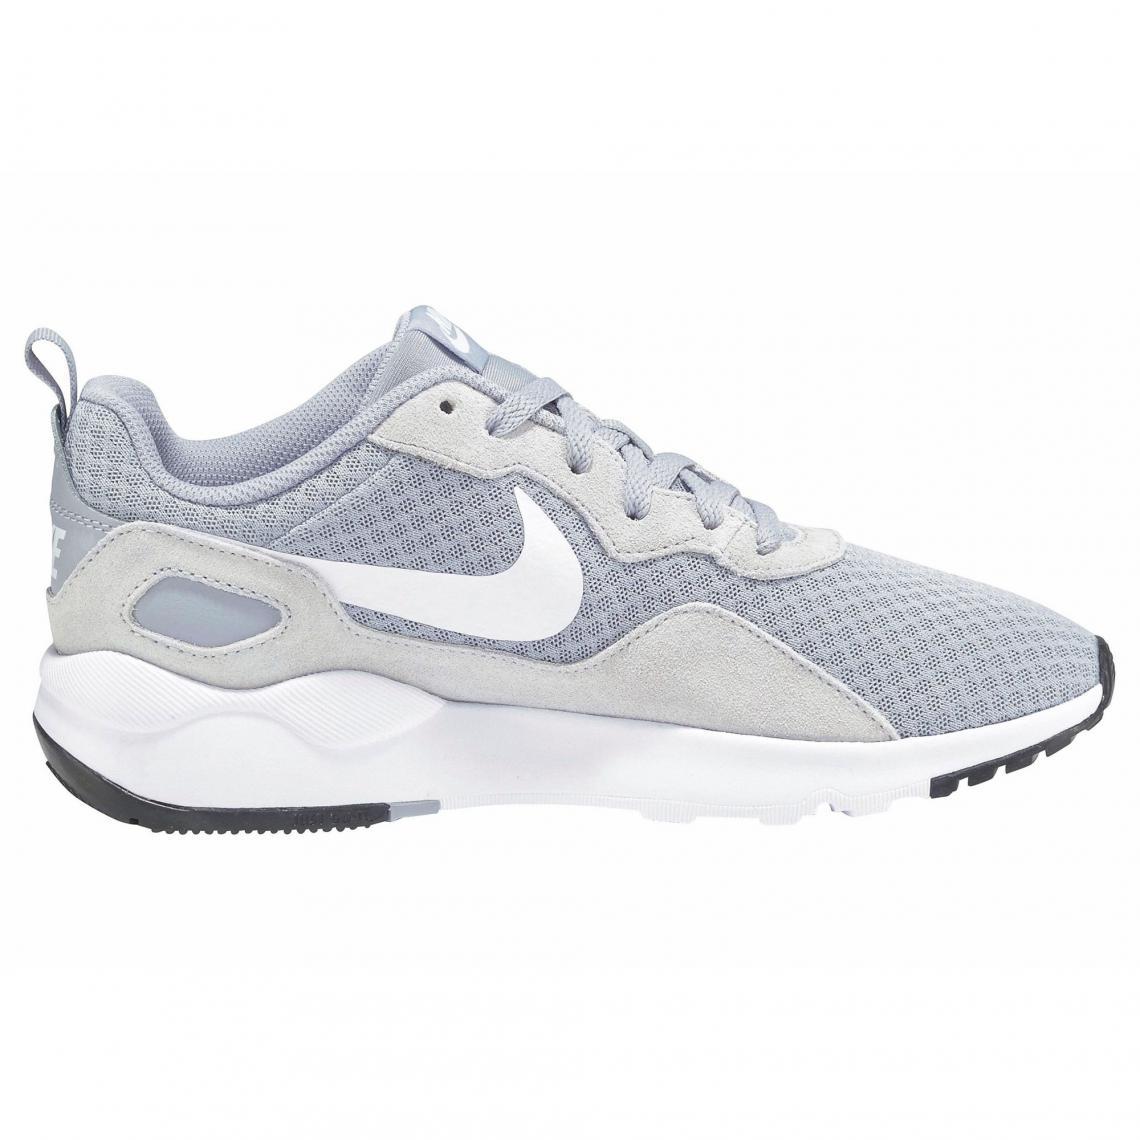 f29cb5352cfa13 Chaussures de running LD Runner W Nike femme - Gris - Blanc   3 SUISSES